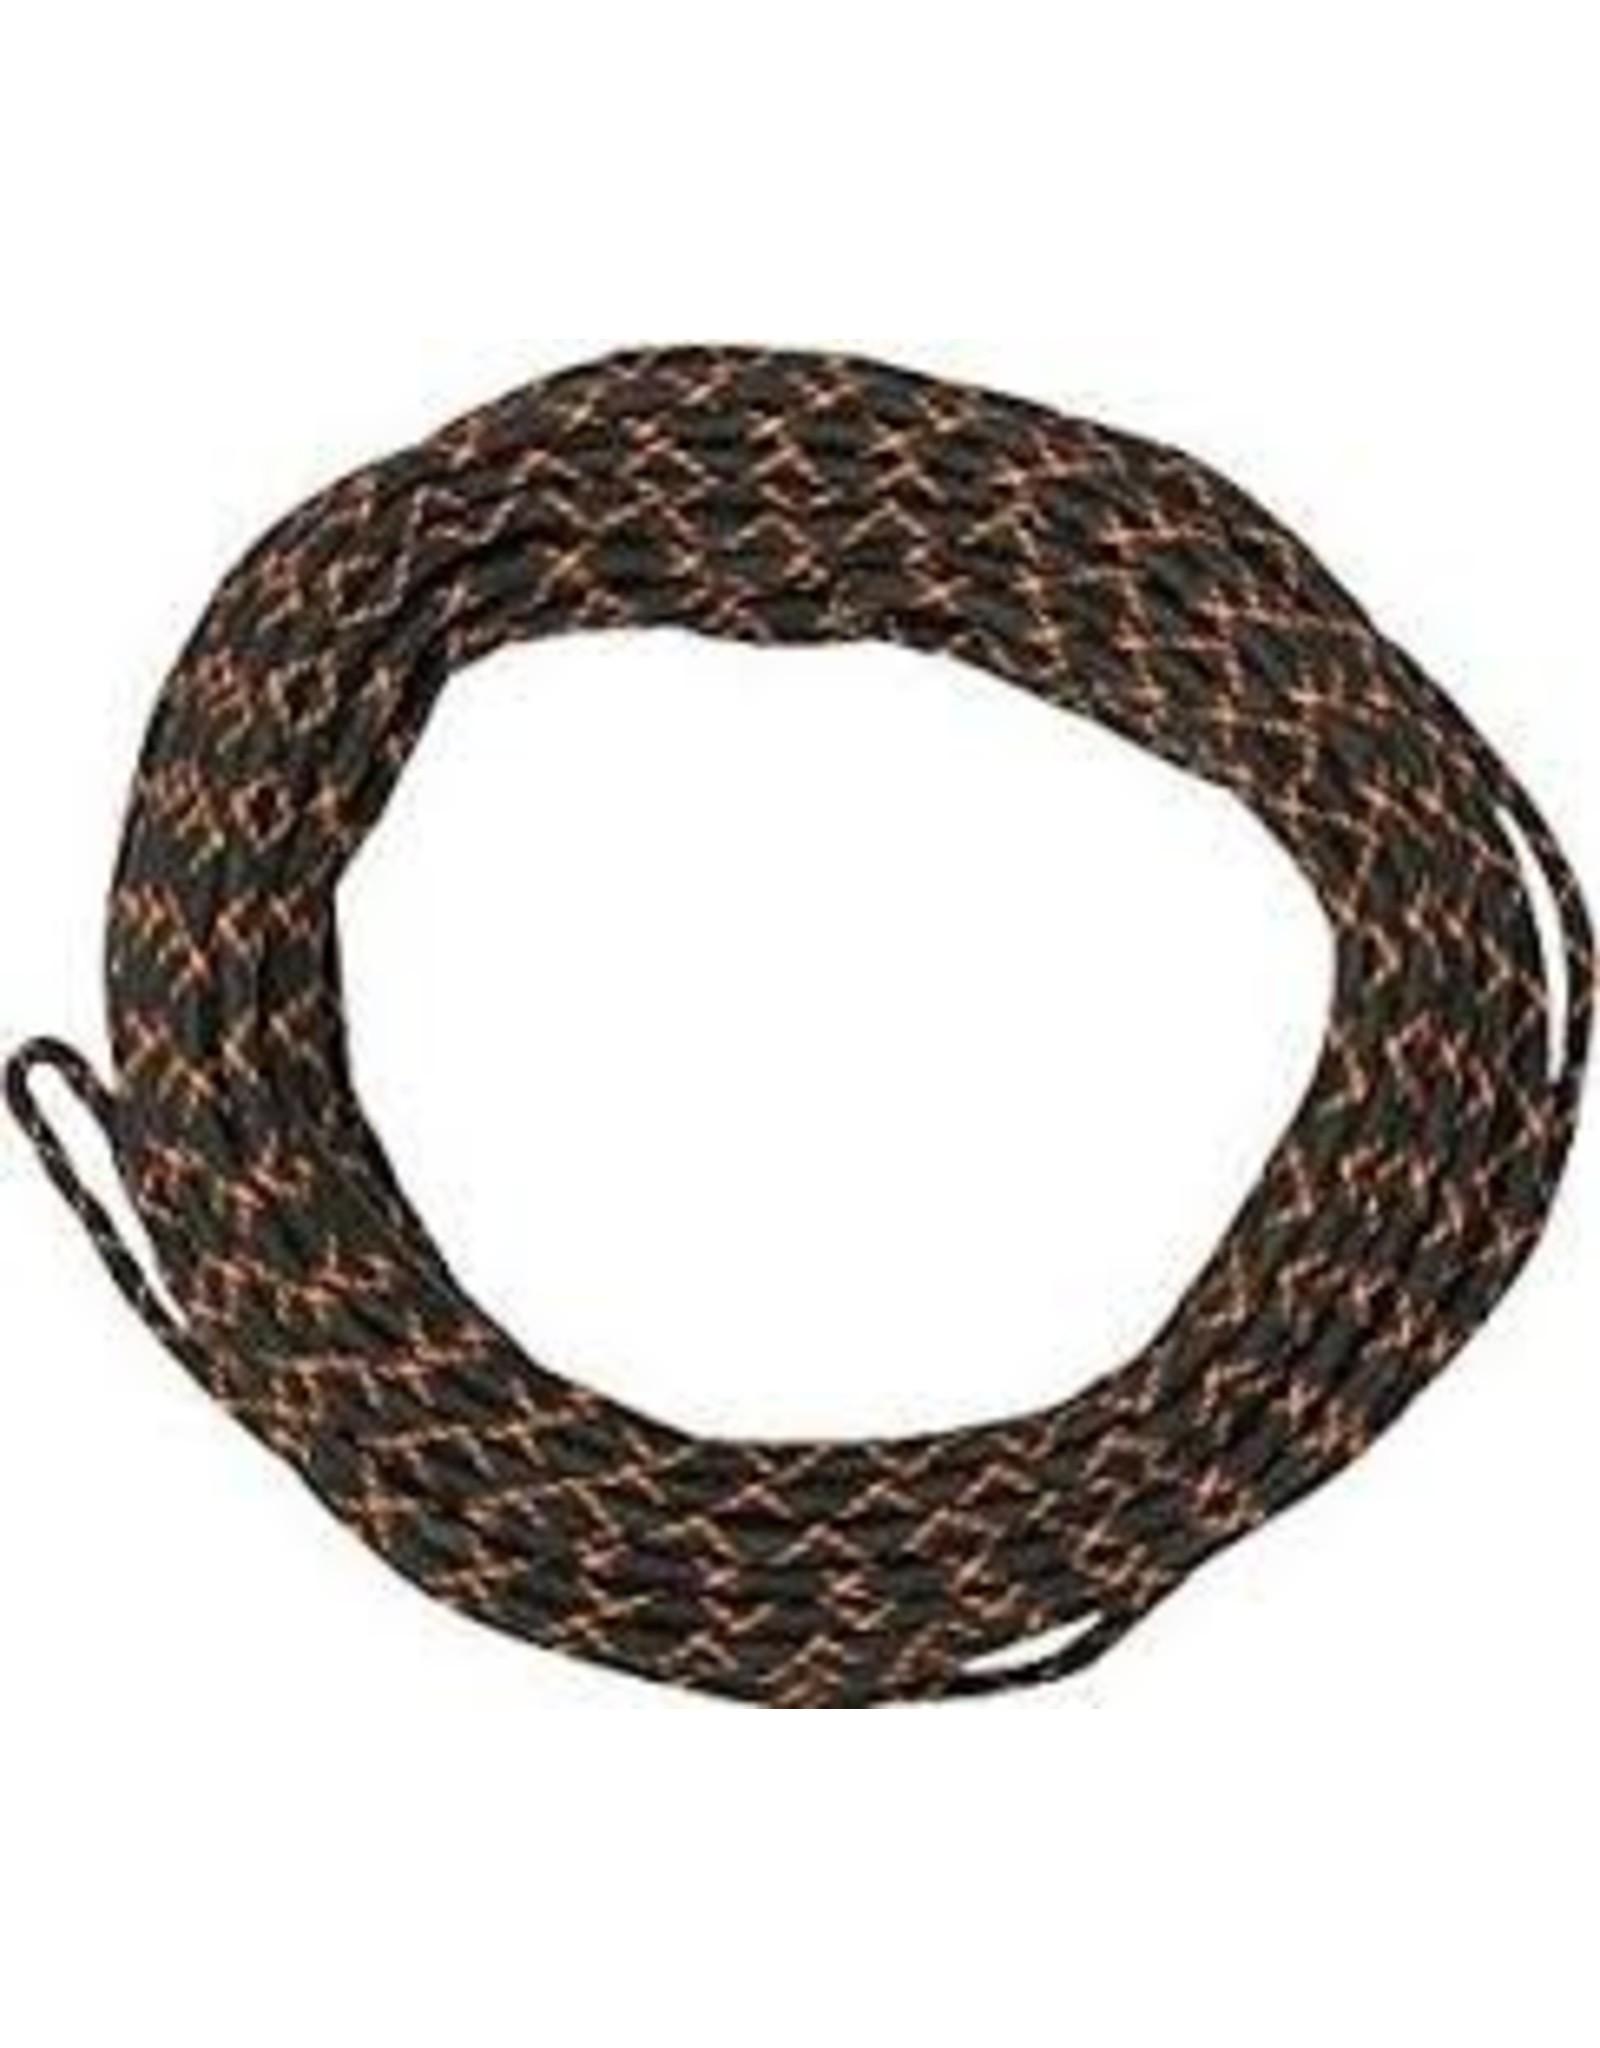 Hyperlite 70 ft Fire Jacket Mainline rope